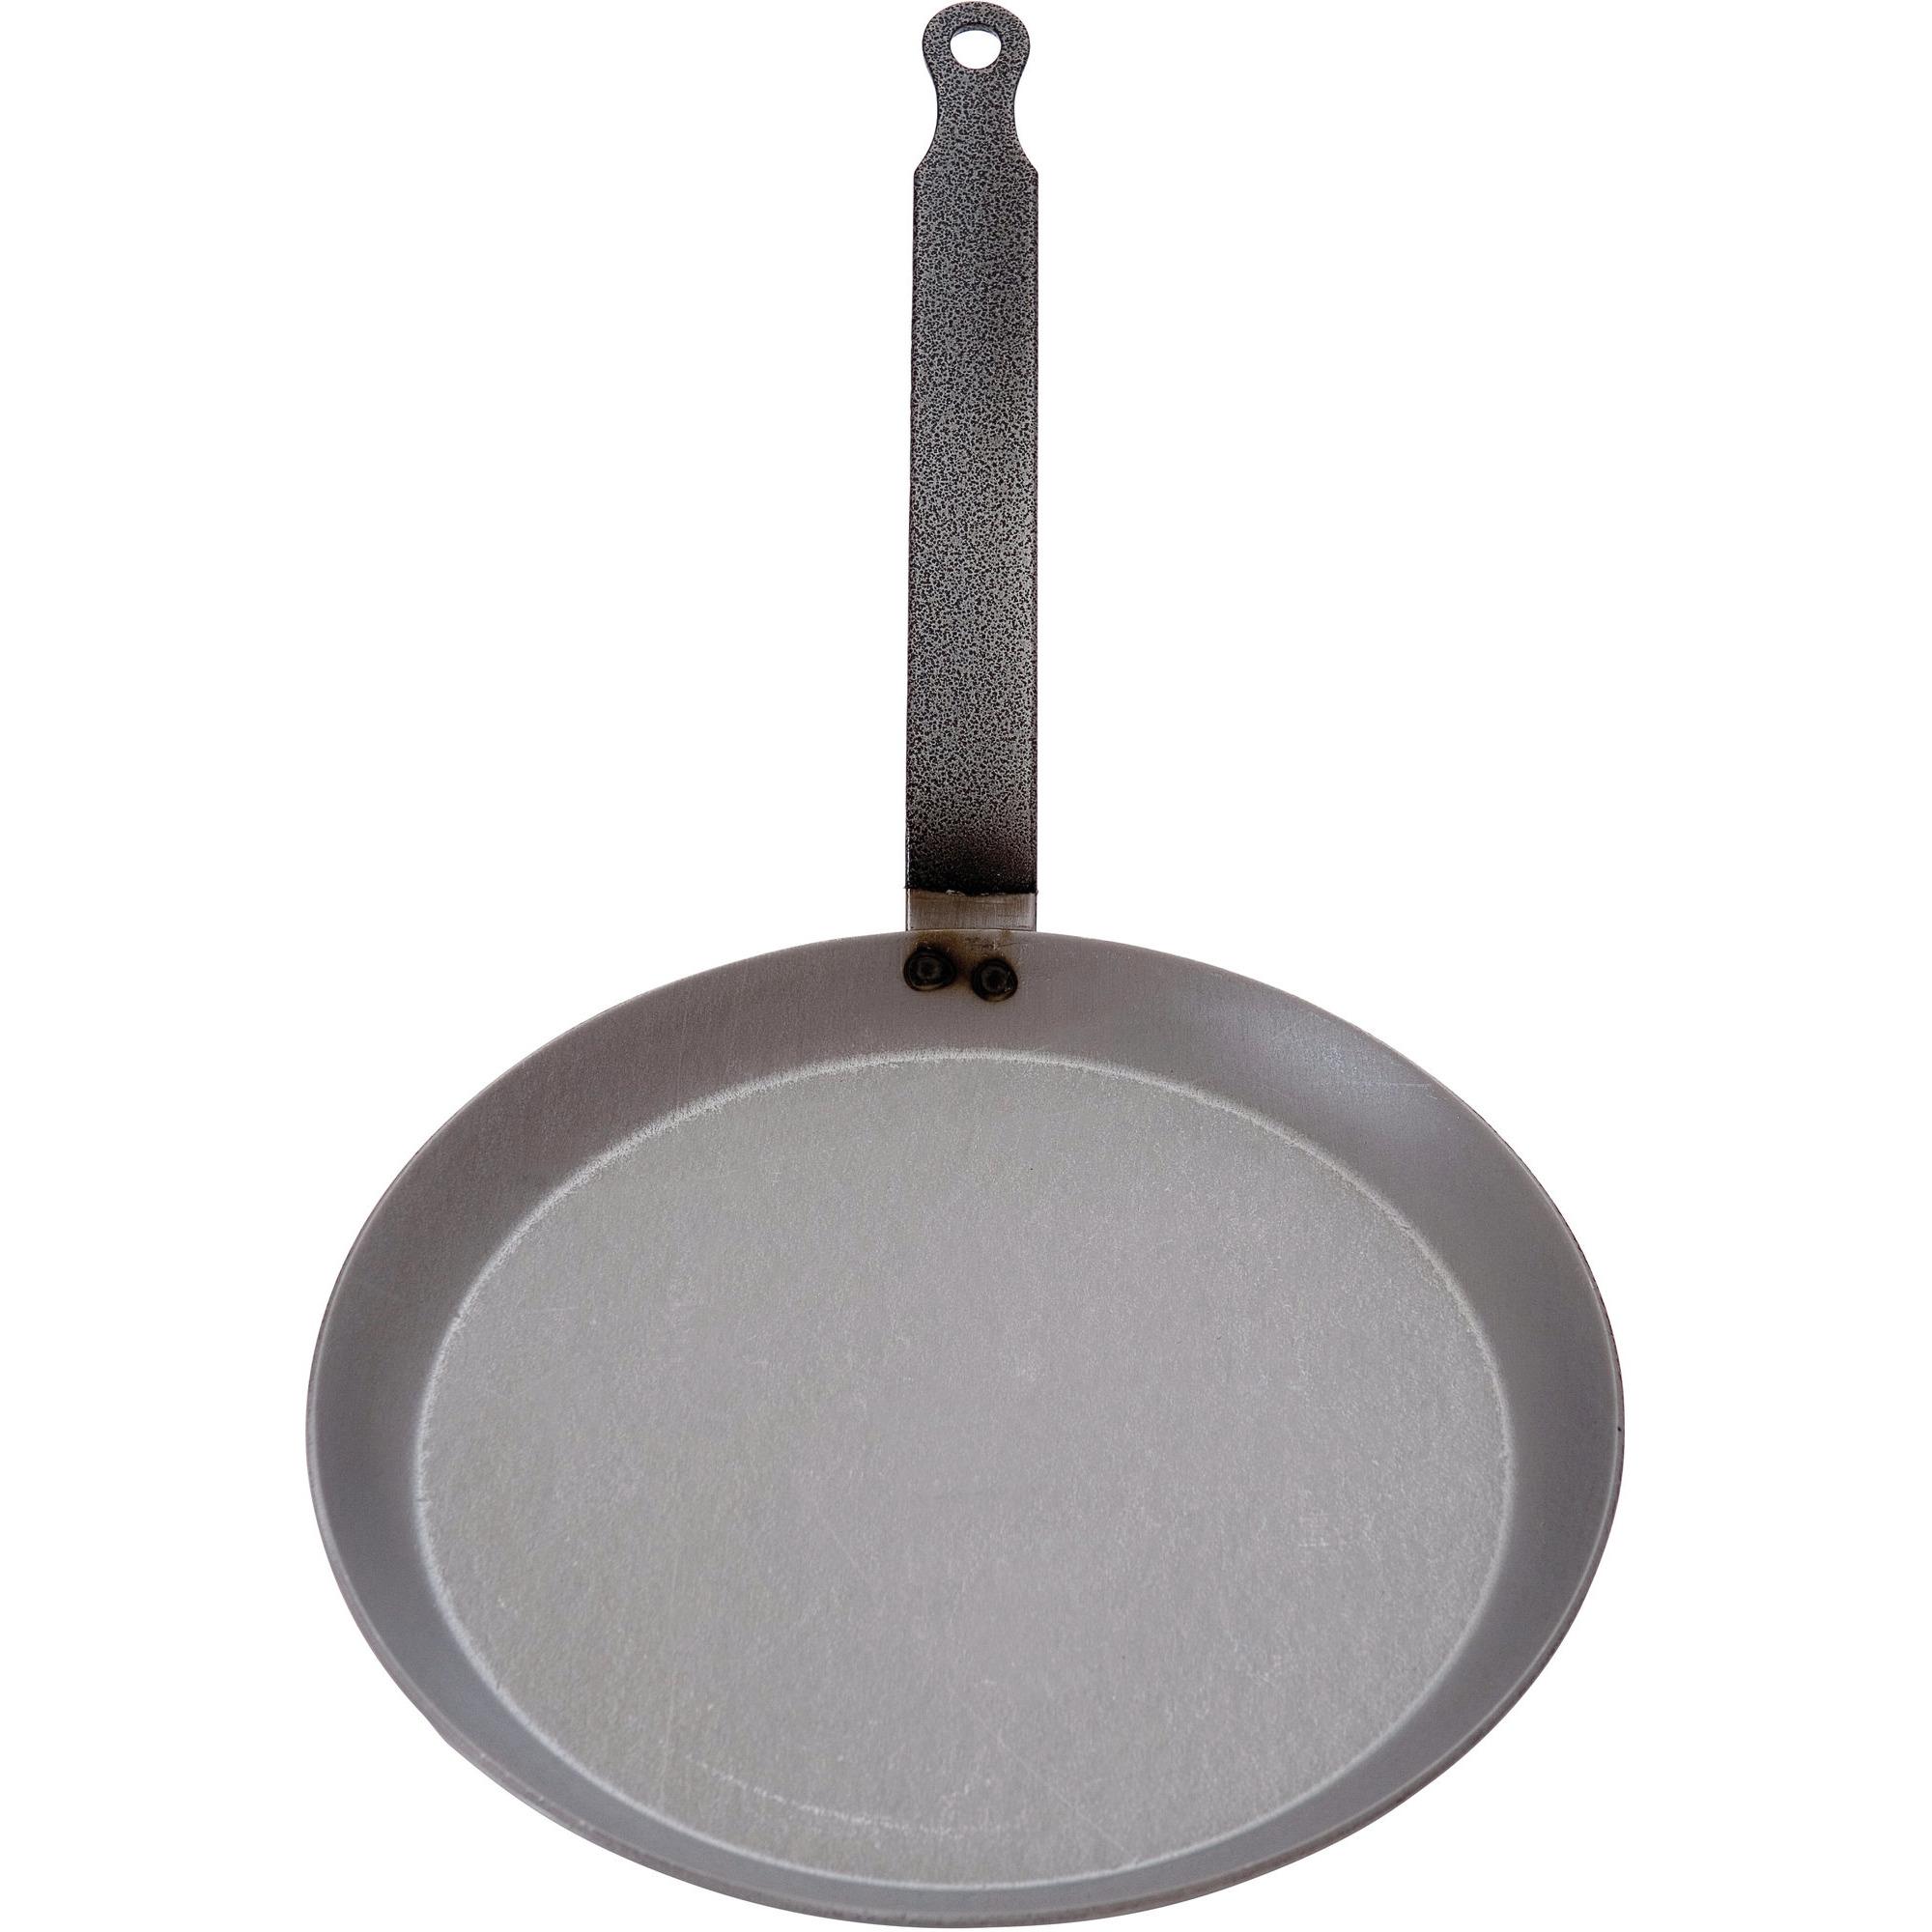 Mauviel Crêpe/pannkakspanna plåt Ø 22 cm